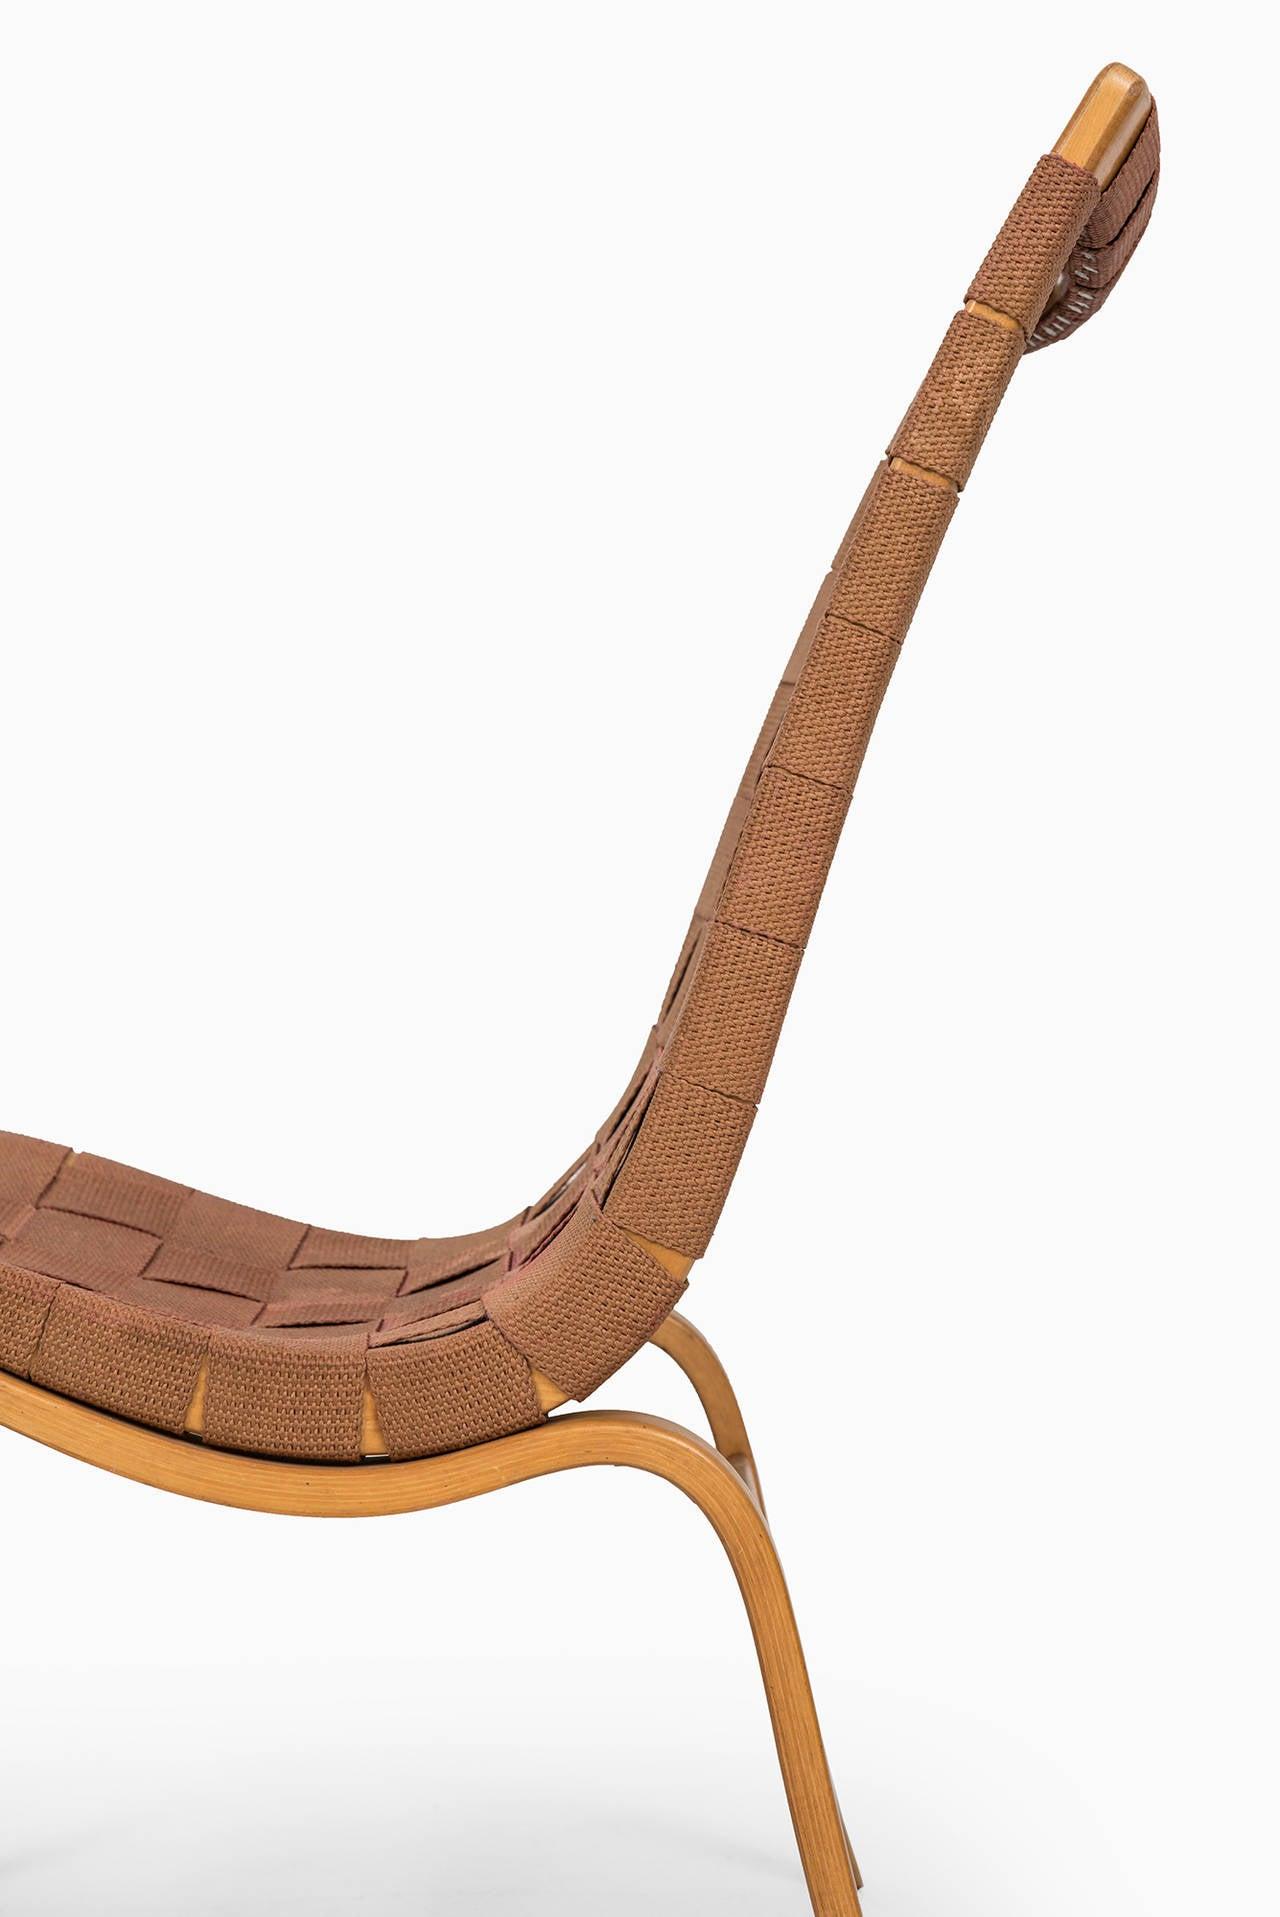 Bruno Mathsson Easy Chair Model Eva by Karl Mathsson in Sweden